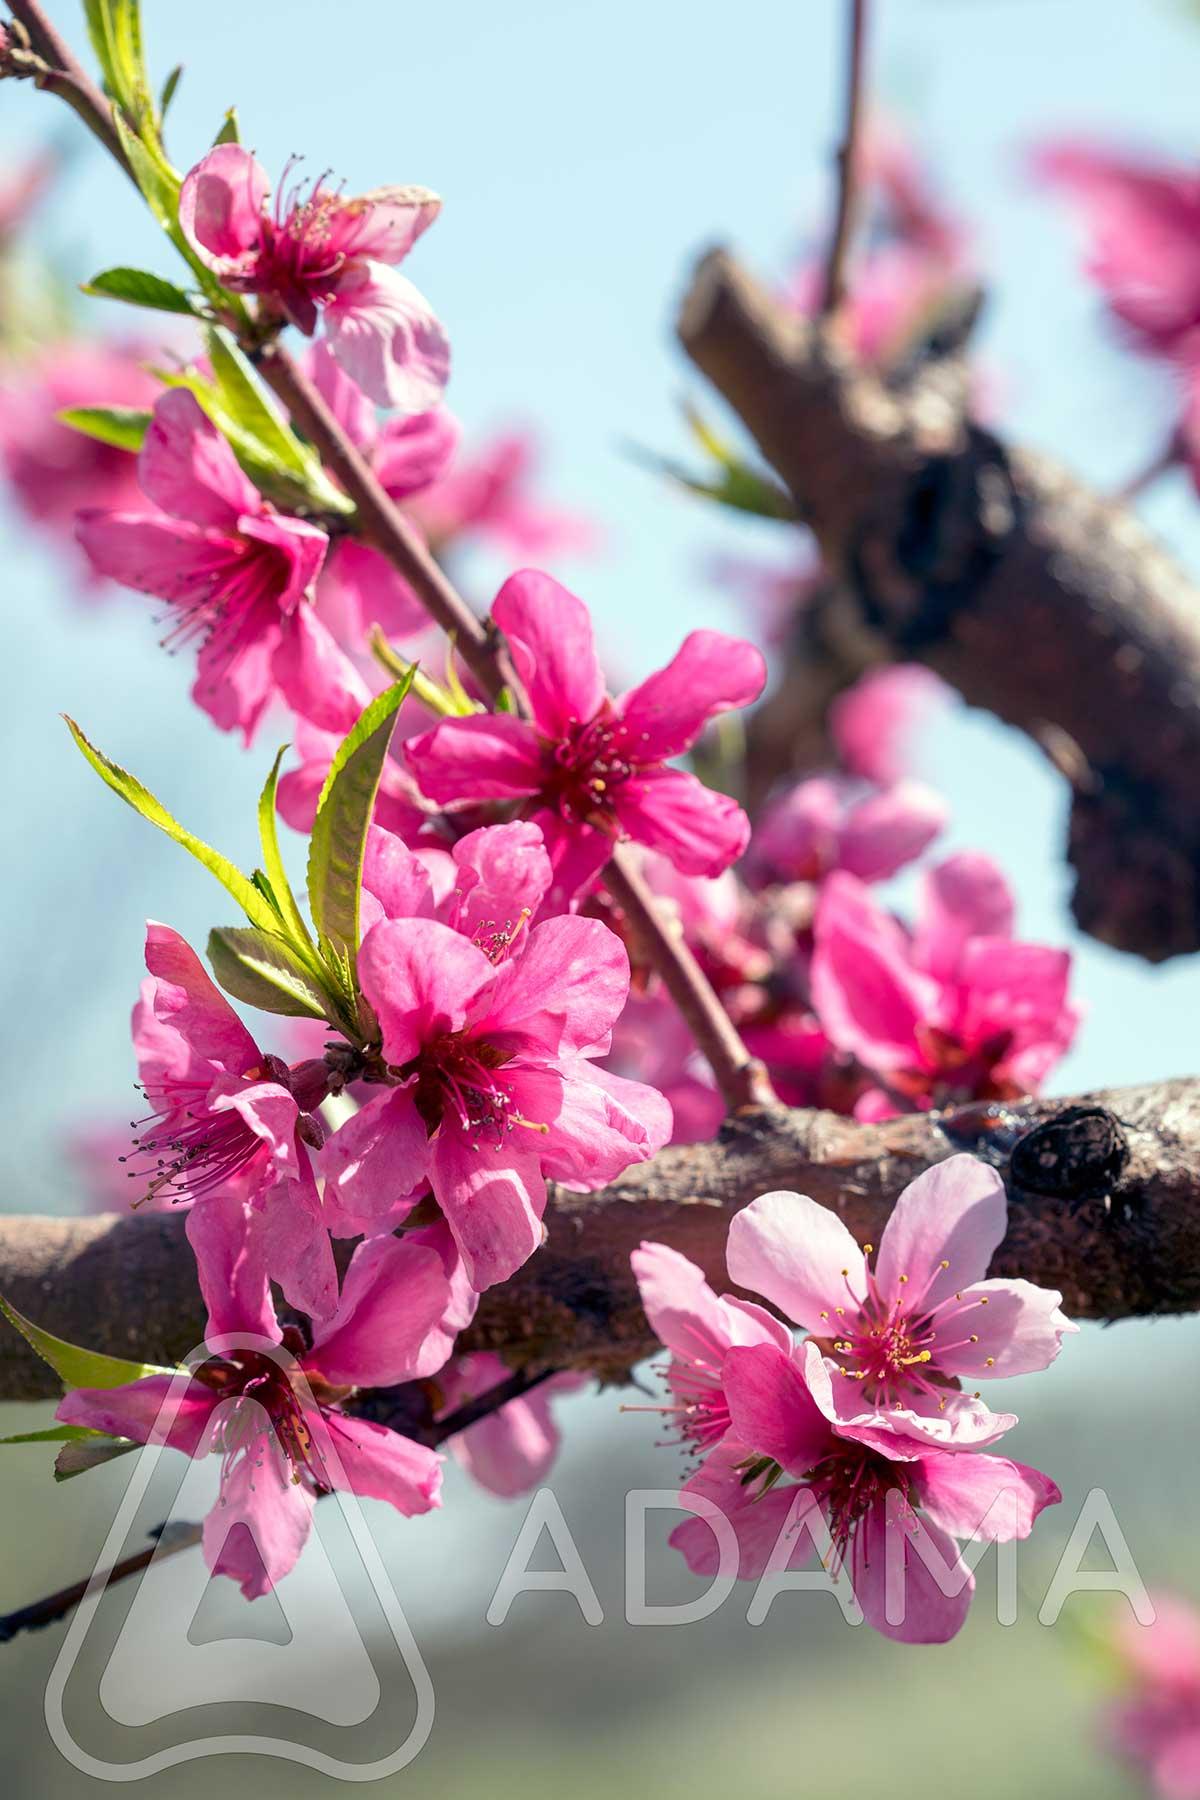 Agrosaveti---Adama---Kajsija---Breskve---kosticavo-voce---cvetanje---Monilia---supljikavost-lista-02